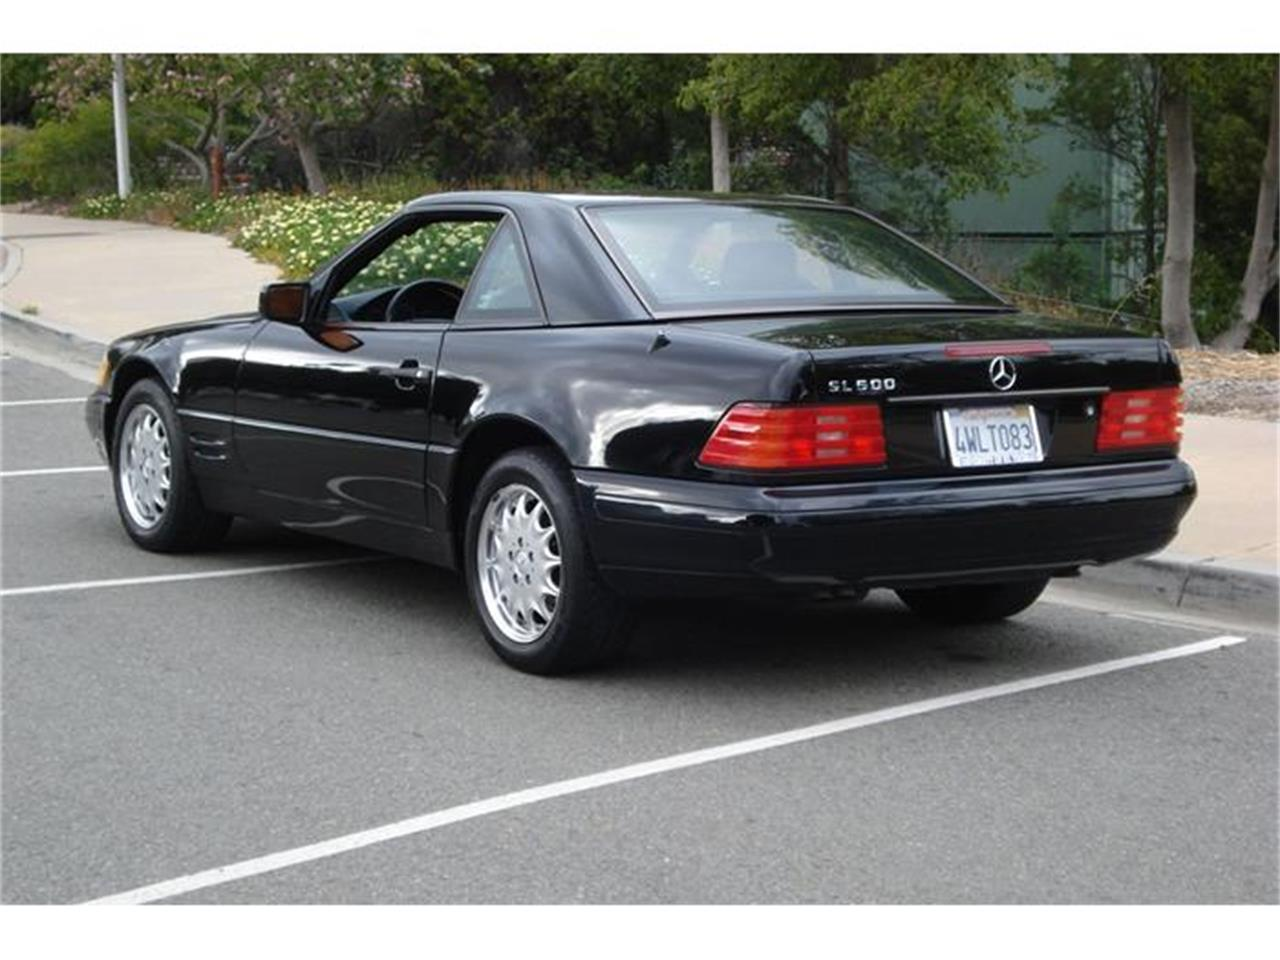 Carfax Dealer Login >> 1998 Mercedes-Benz SL500 for Sale | ClassicCars.com | CC